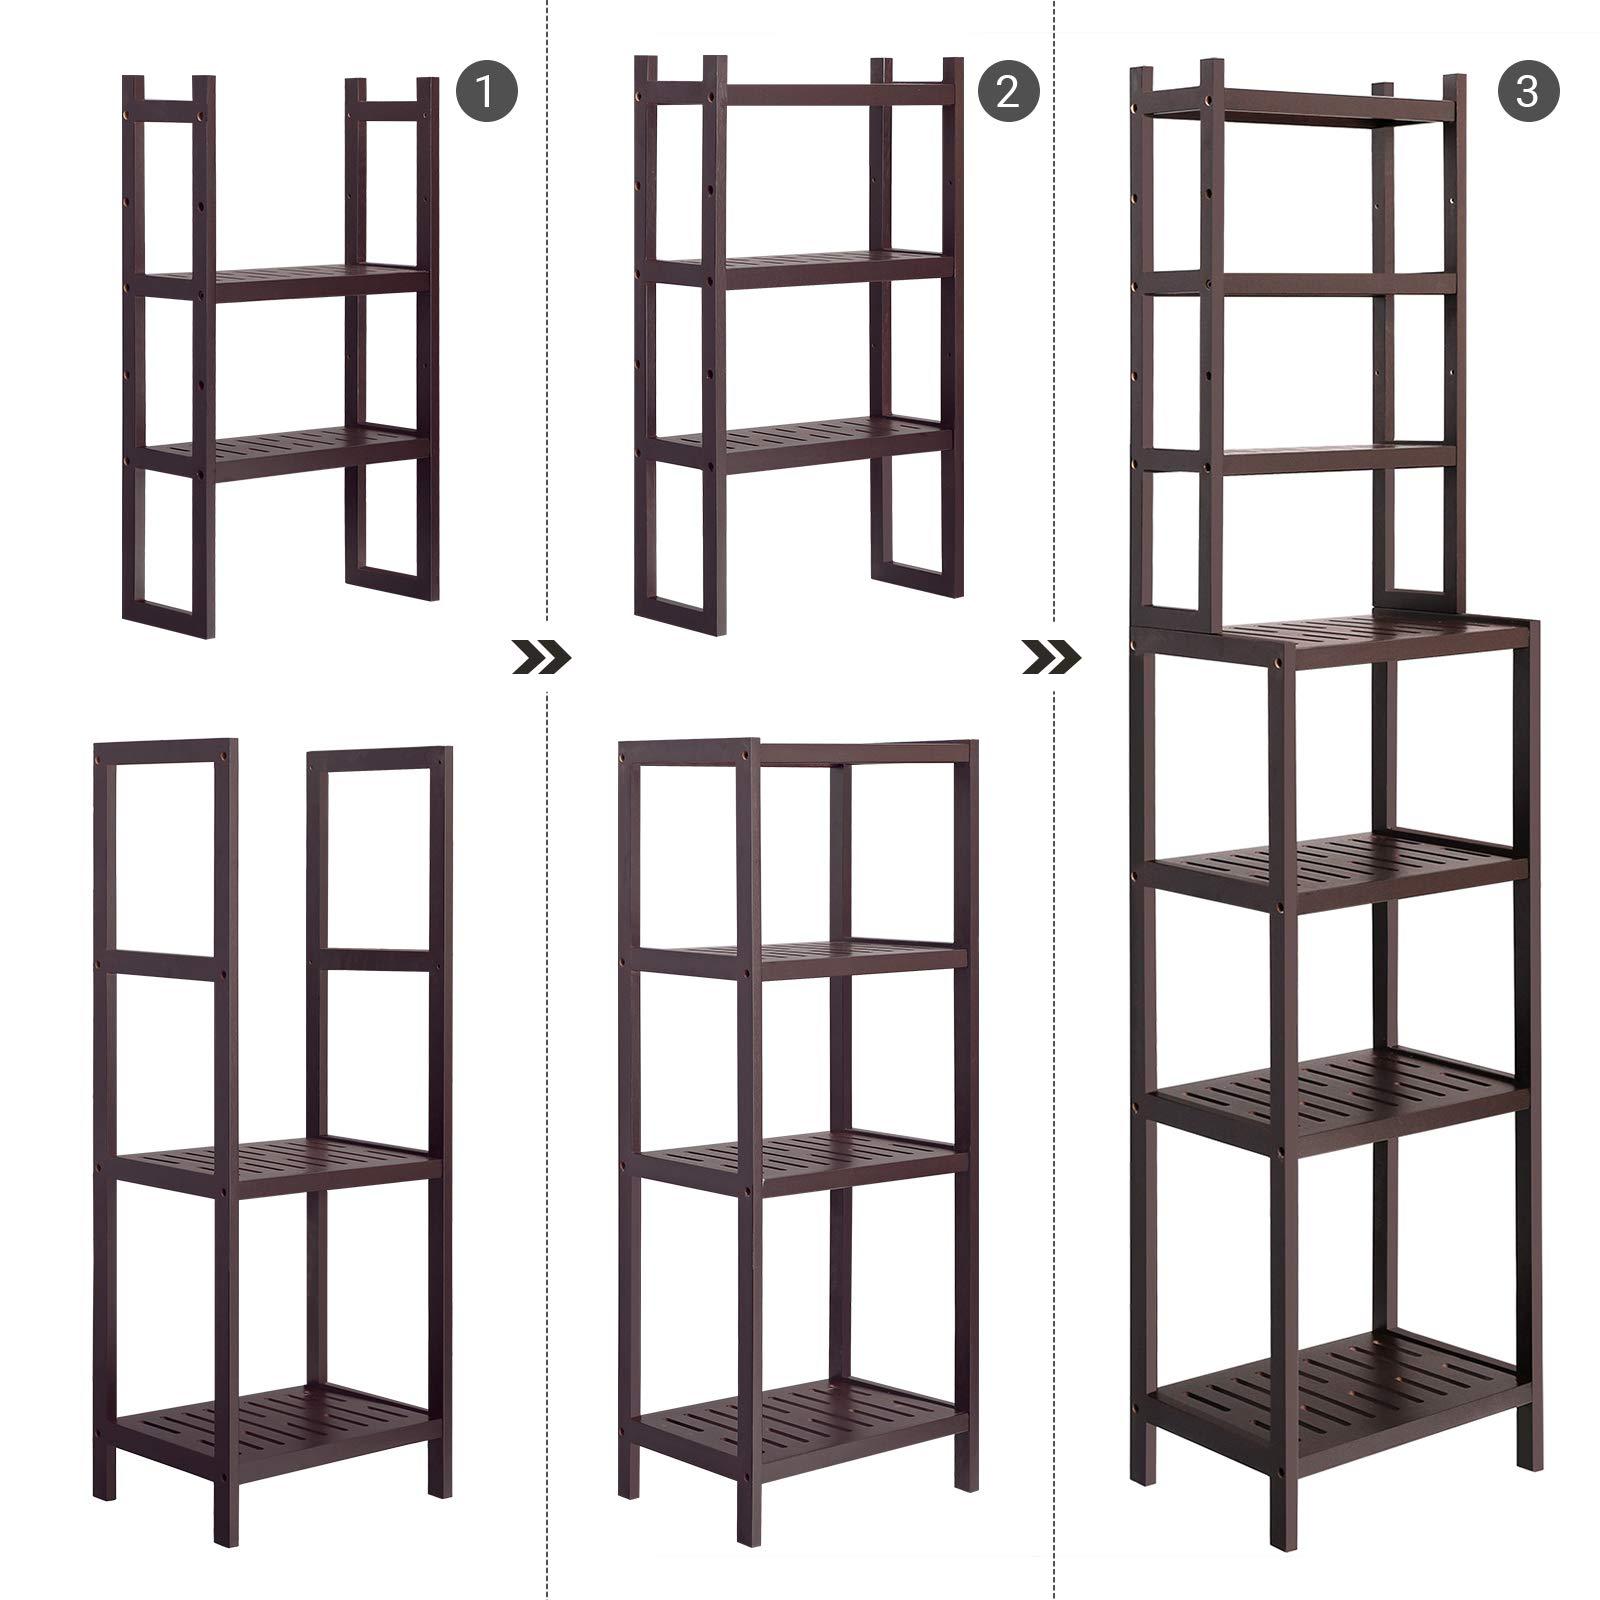 SONGMICS 7-Tier Bamboo Bathroom Shelf, 2-in-1 Design Adjustable Storage Rack, Free Standing Multifunctional Organizer, Shelving Unit for Washroom, Living Room, Kitchen, Brown UBCR01BR by SONGMICS (Image #9)